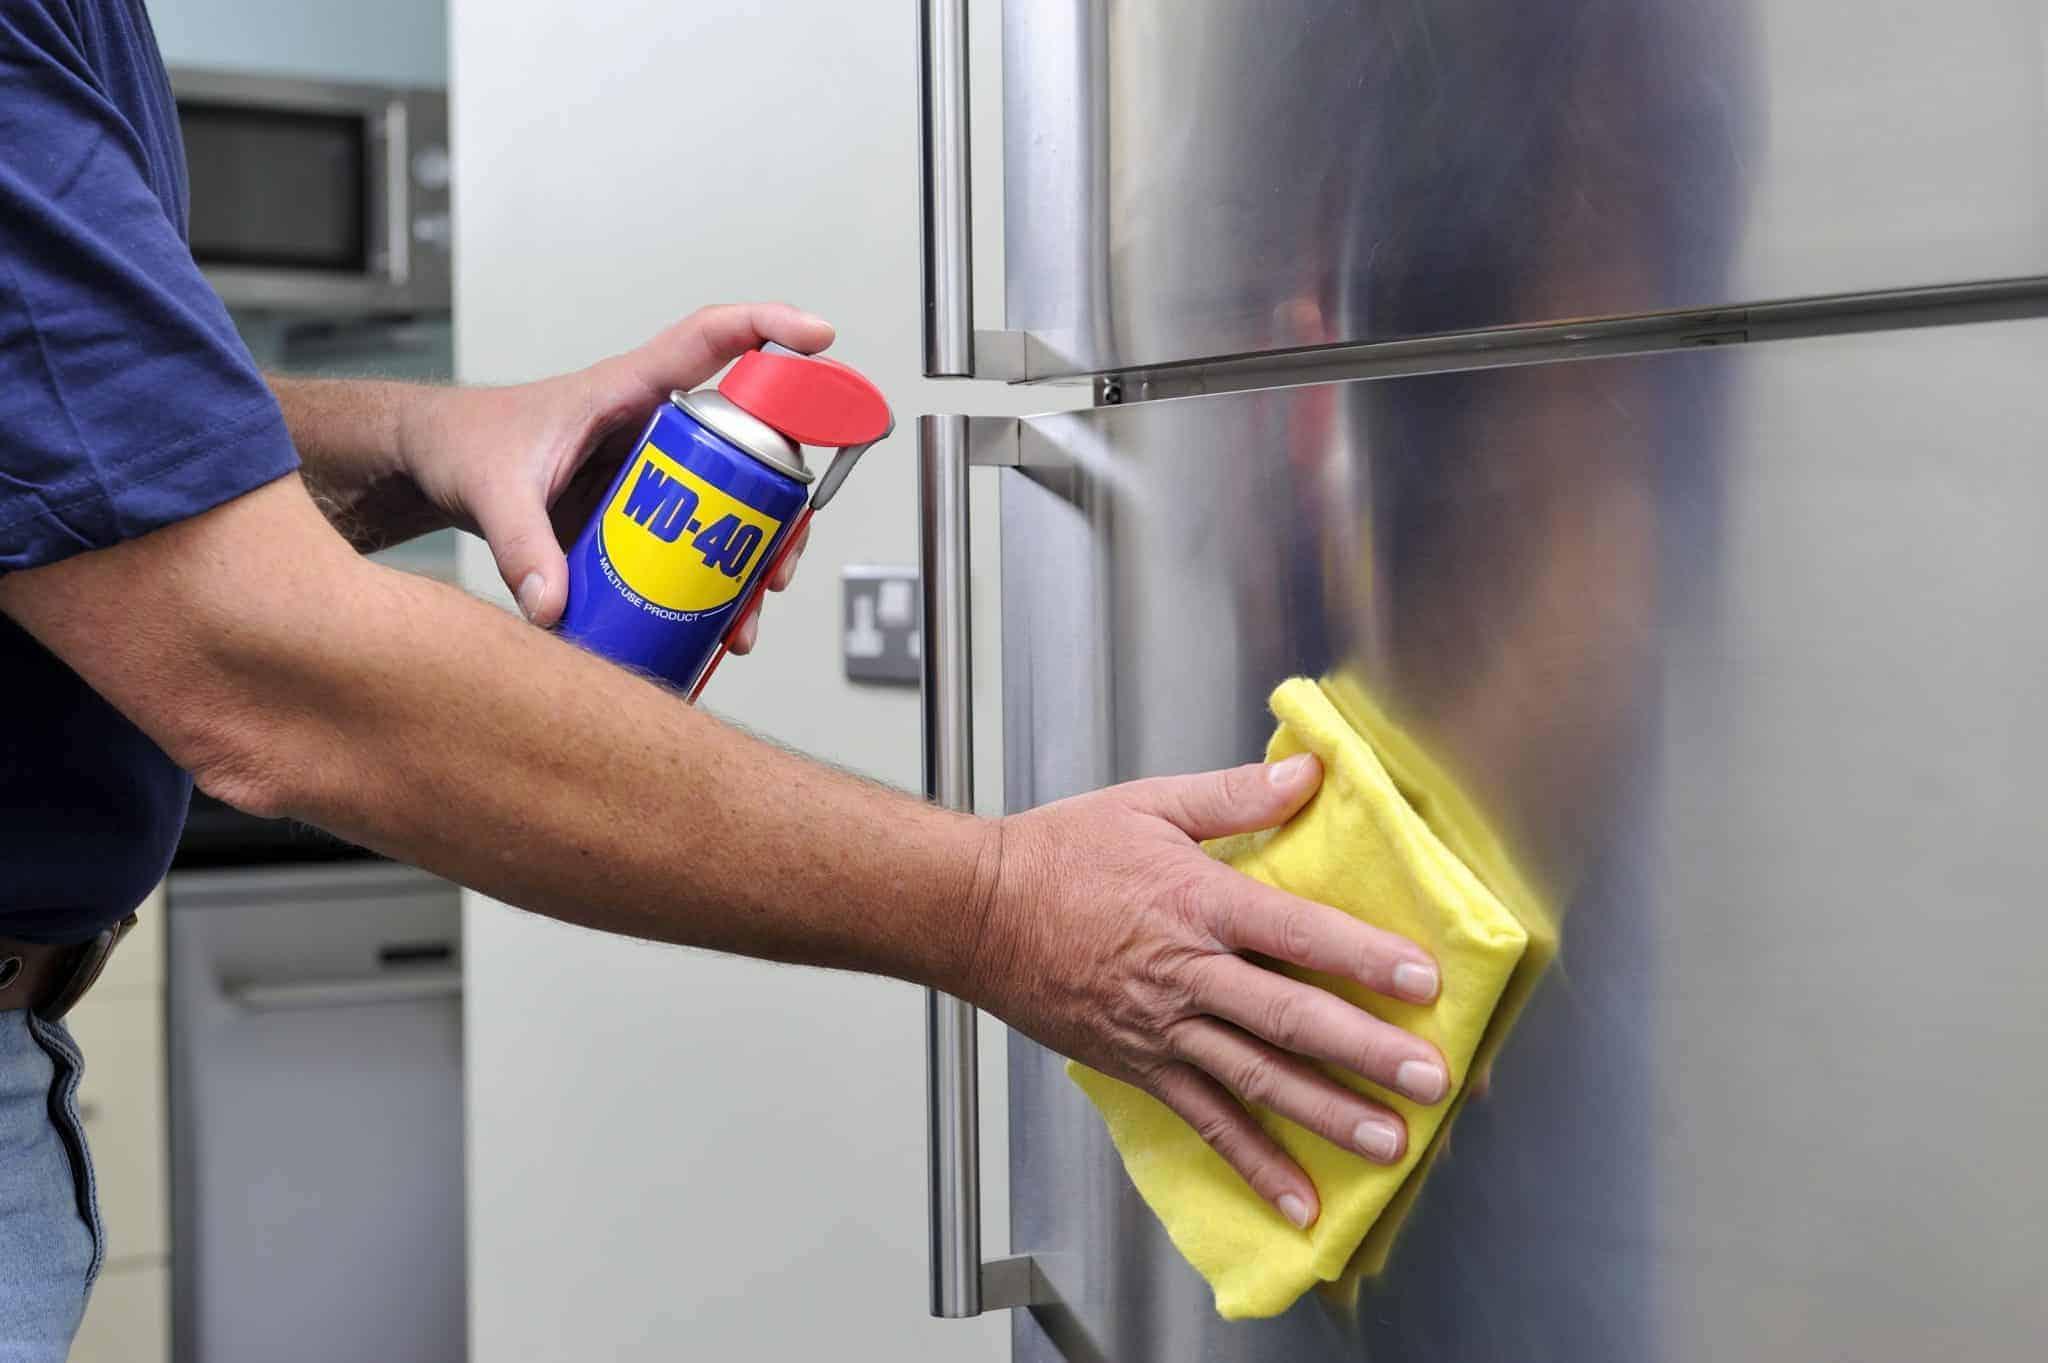 Comment nettoyer l'acier inoxydable ?